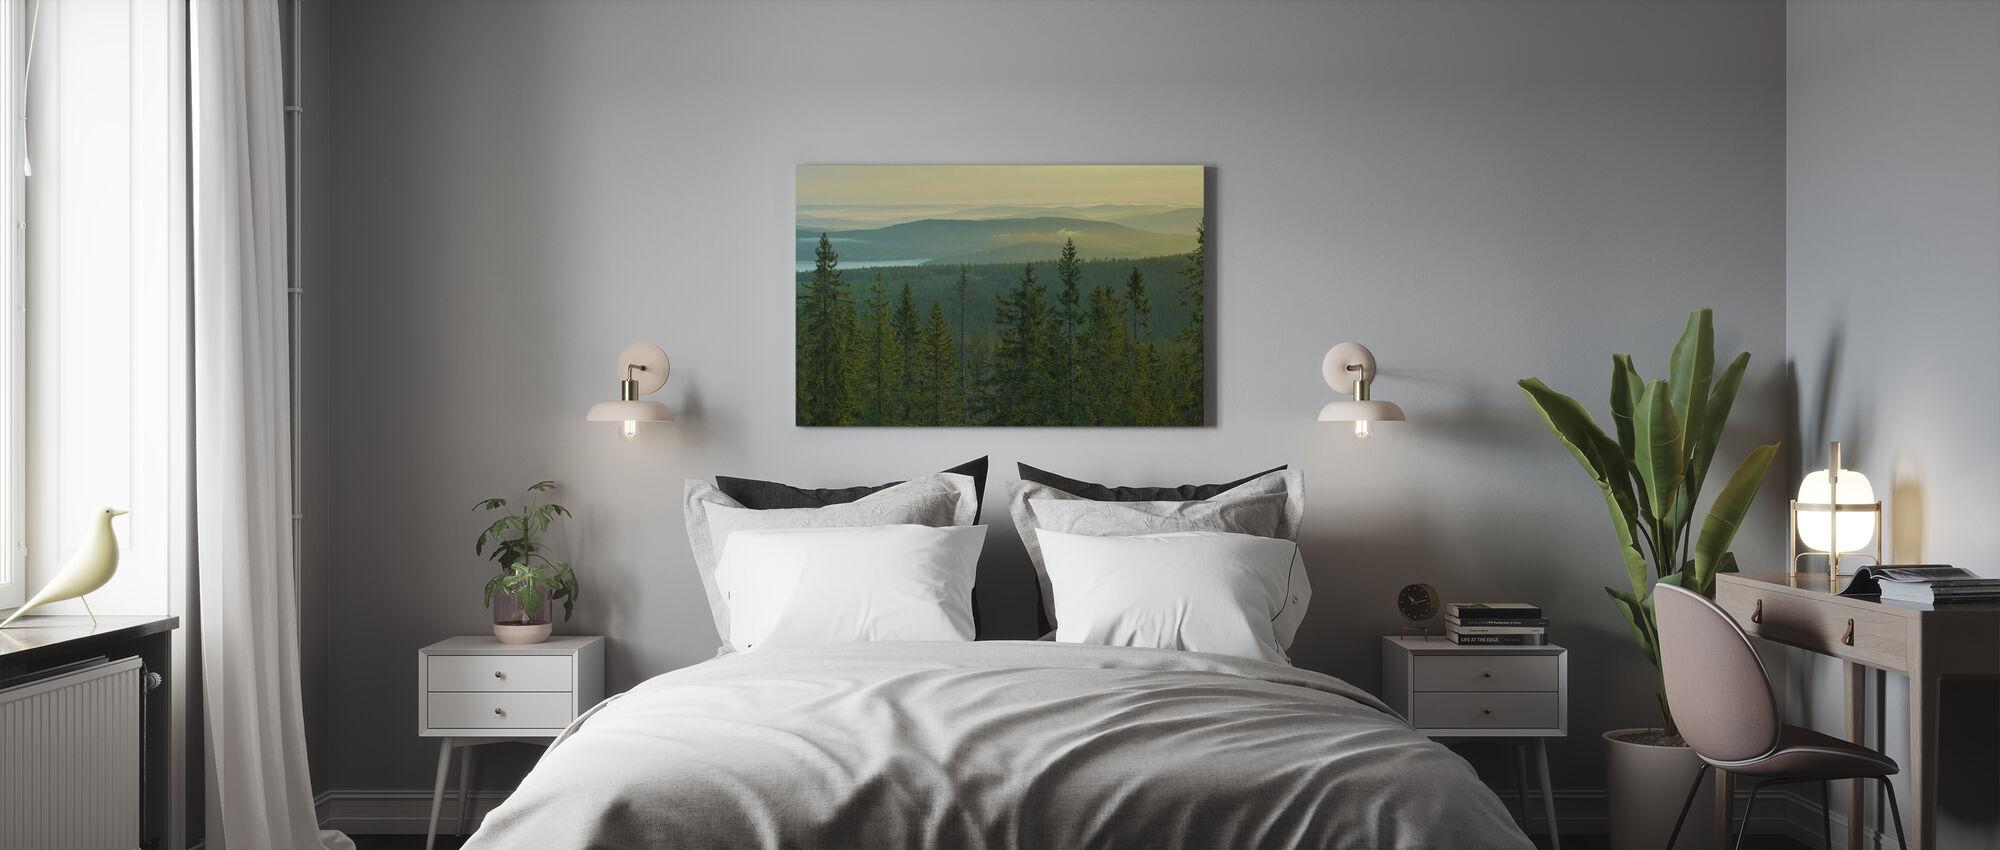 Sparren Topjes in Nationaal Park Skuleskogen, Zweden - Canvas print - Slaapkamer